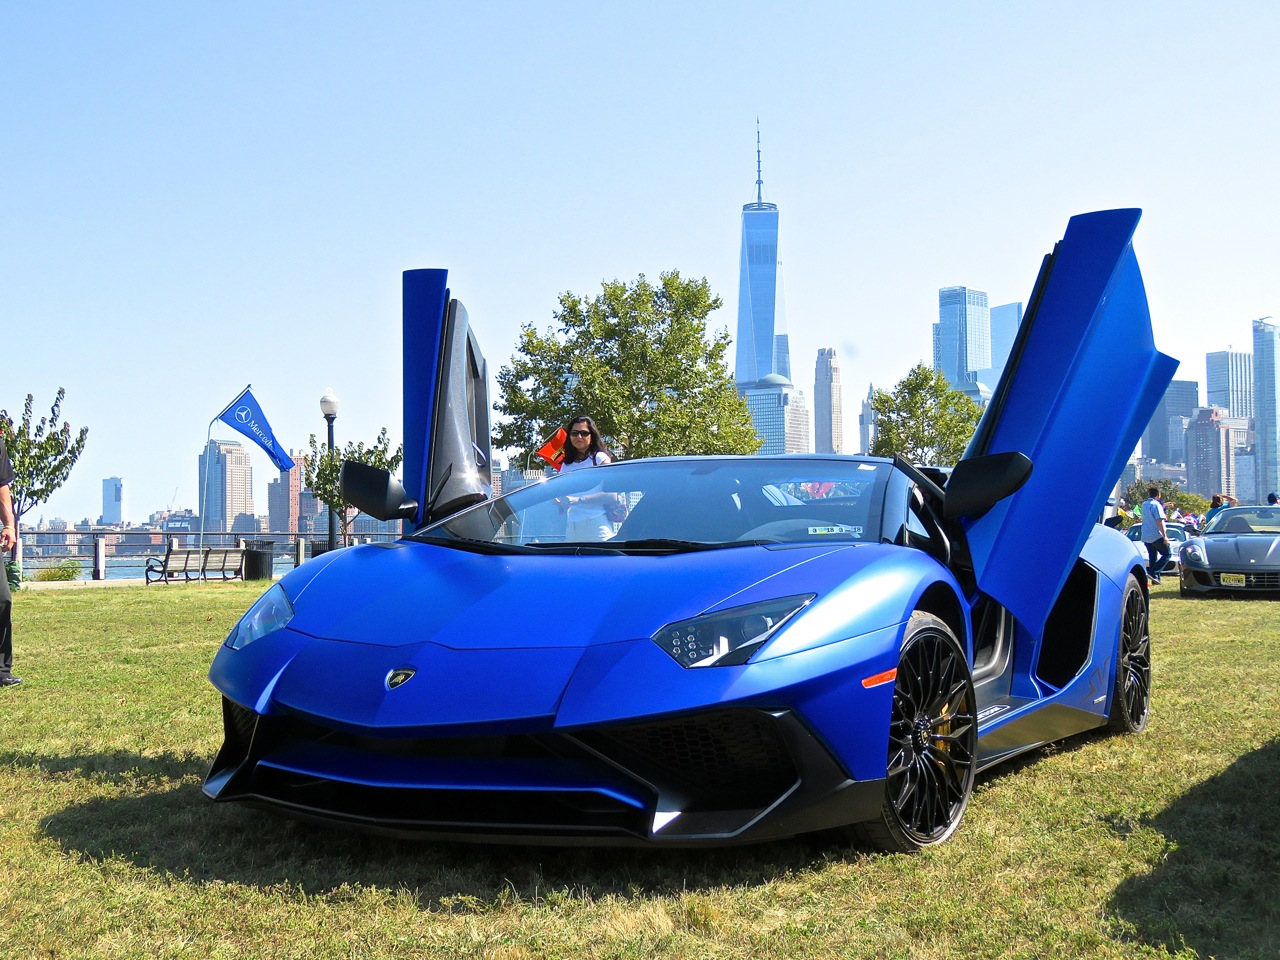 Lamborghini Aventador SV Roadster Blue